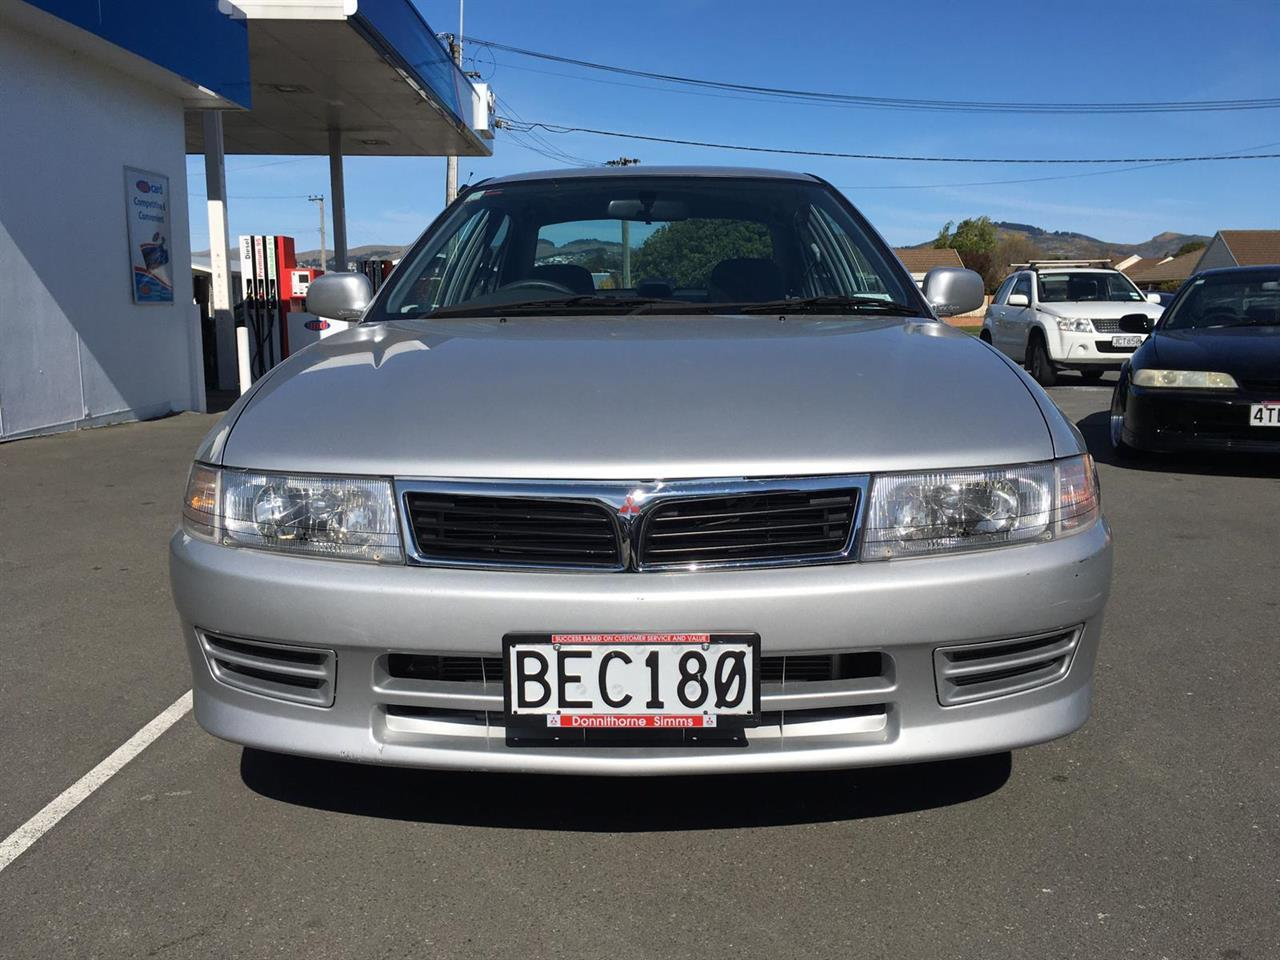 image-5, 2003 Mitsubishi LANCER at Christchurch